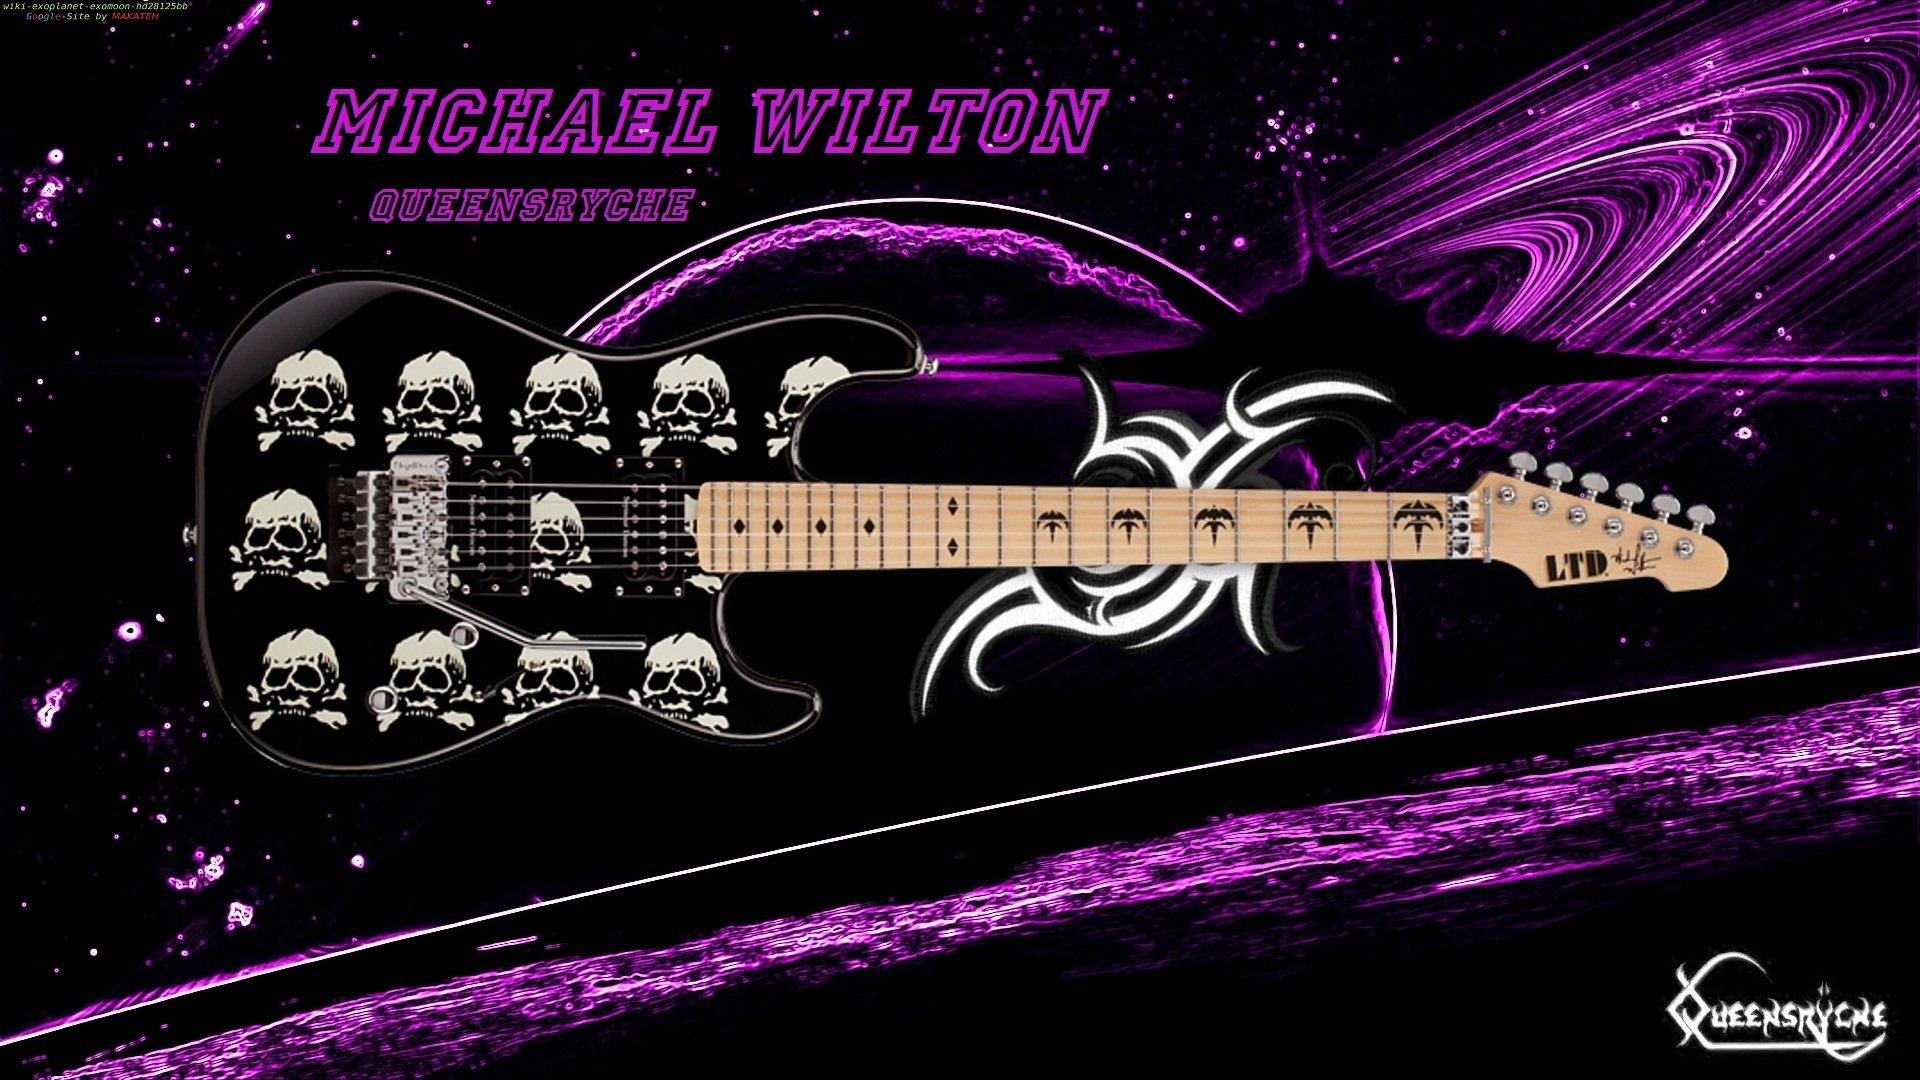 Hd wallpaper gitar - Hd Wallpaper Background Id 383828 1920x1080 Music Guitar